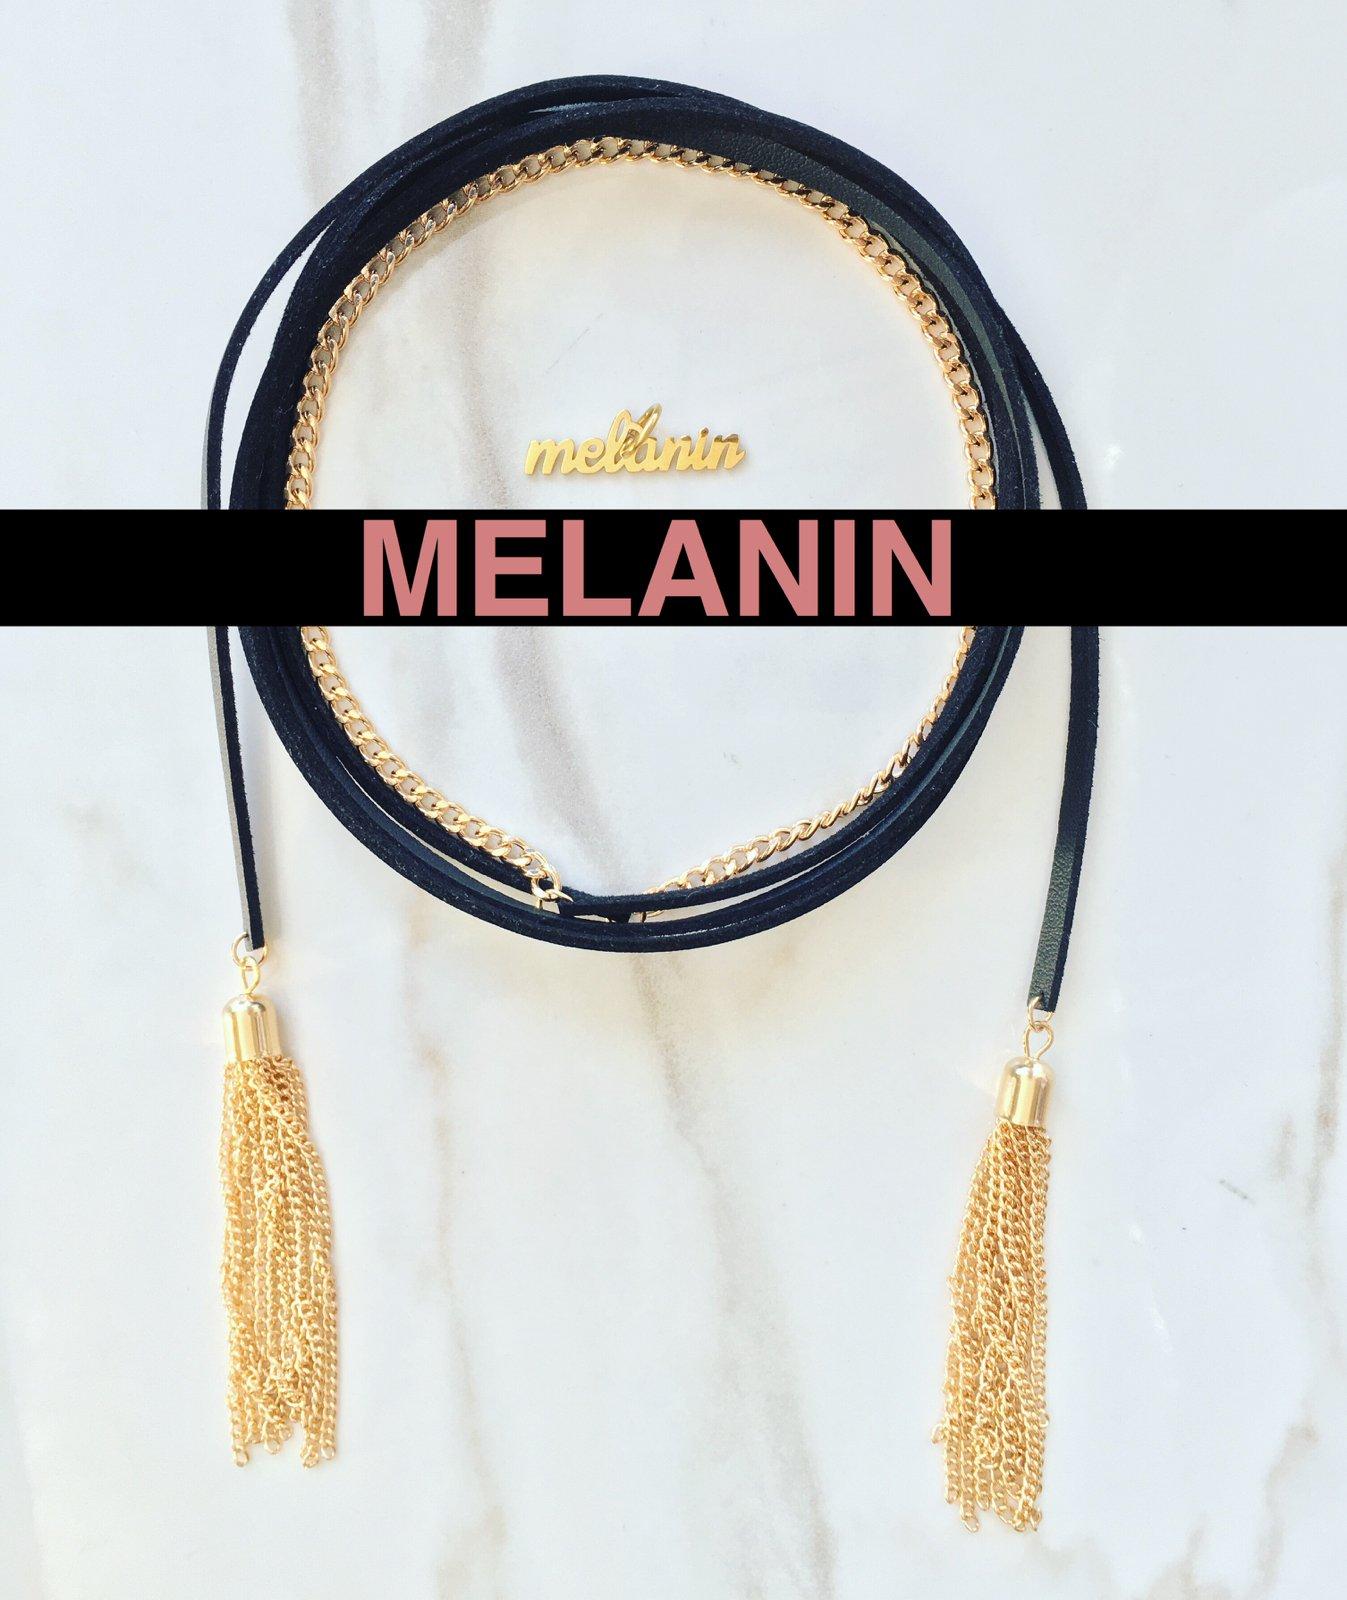 Image of Leather Rope w/ Melanin Charm